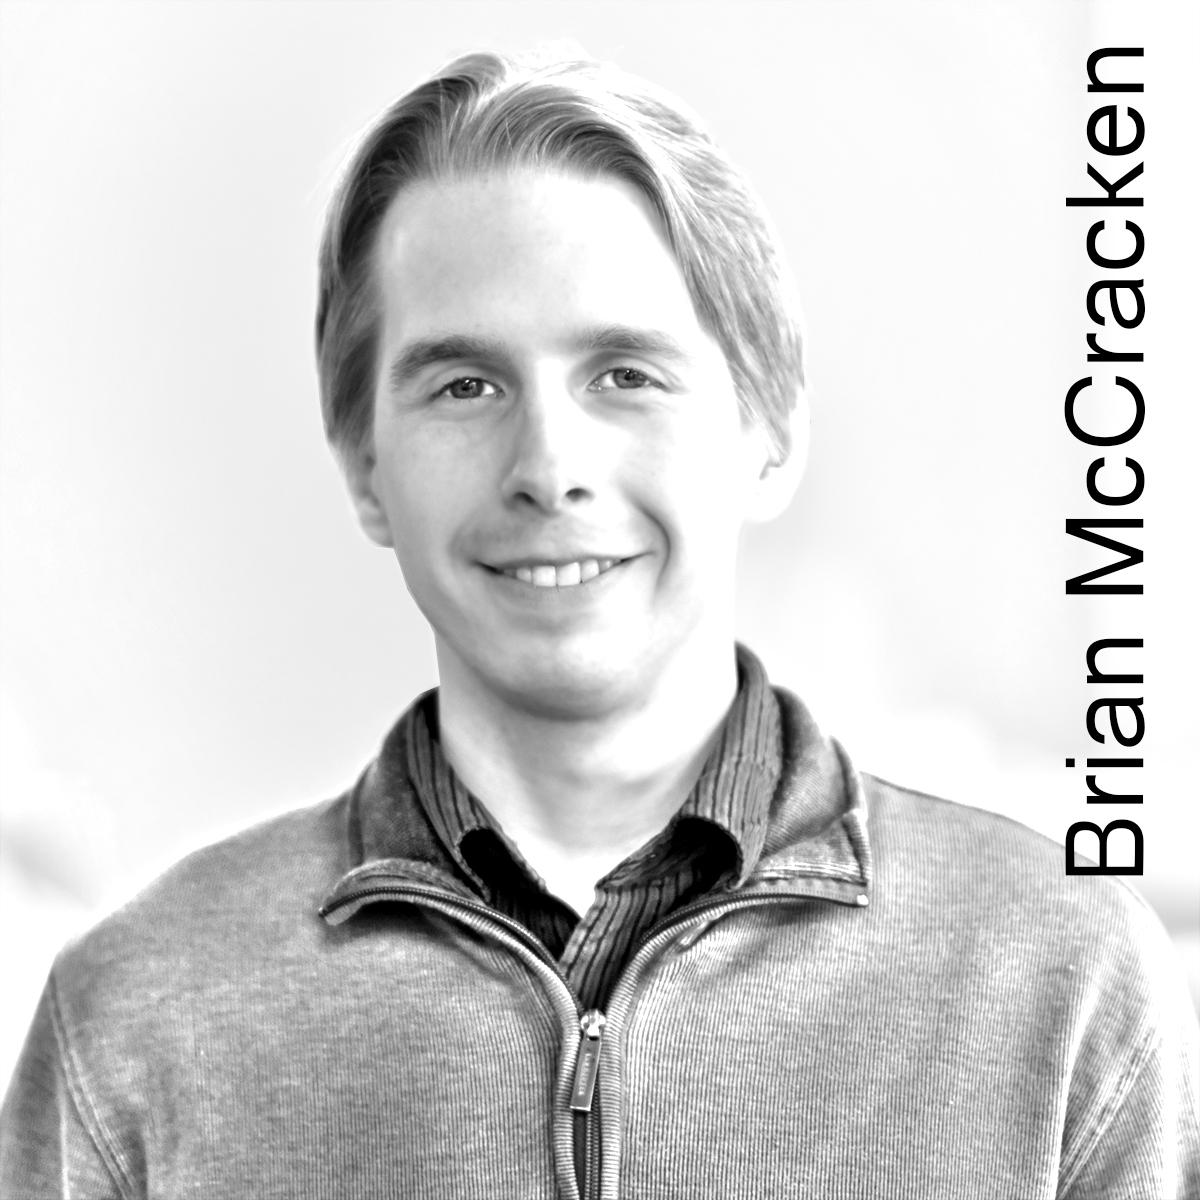 brian_mccracken_square_copy4.jpg